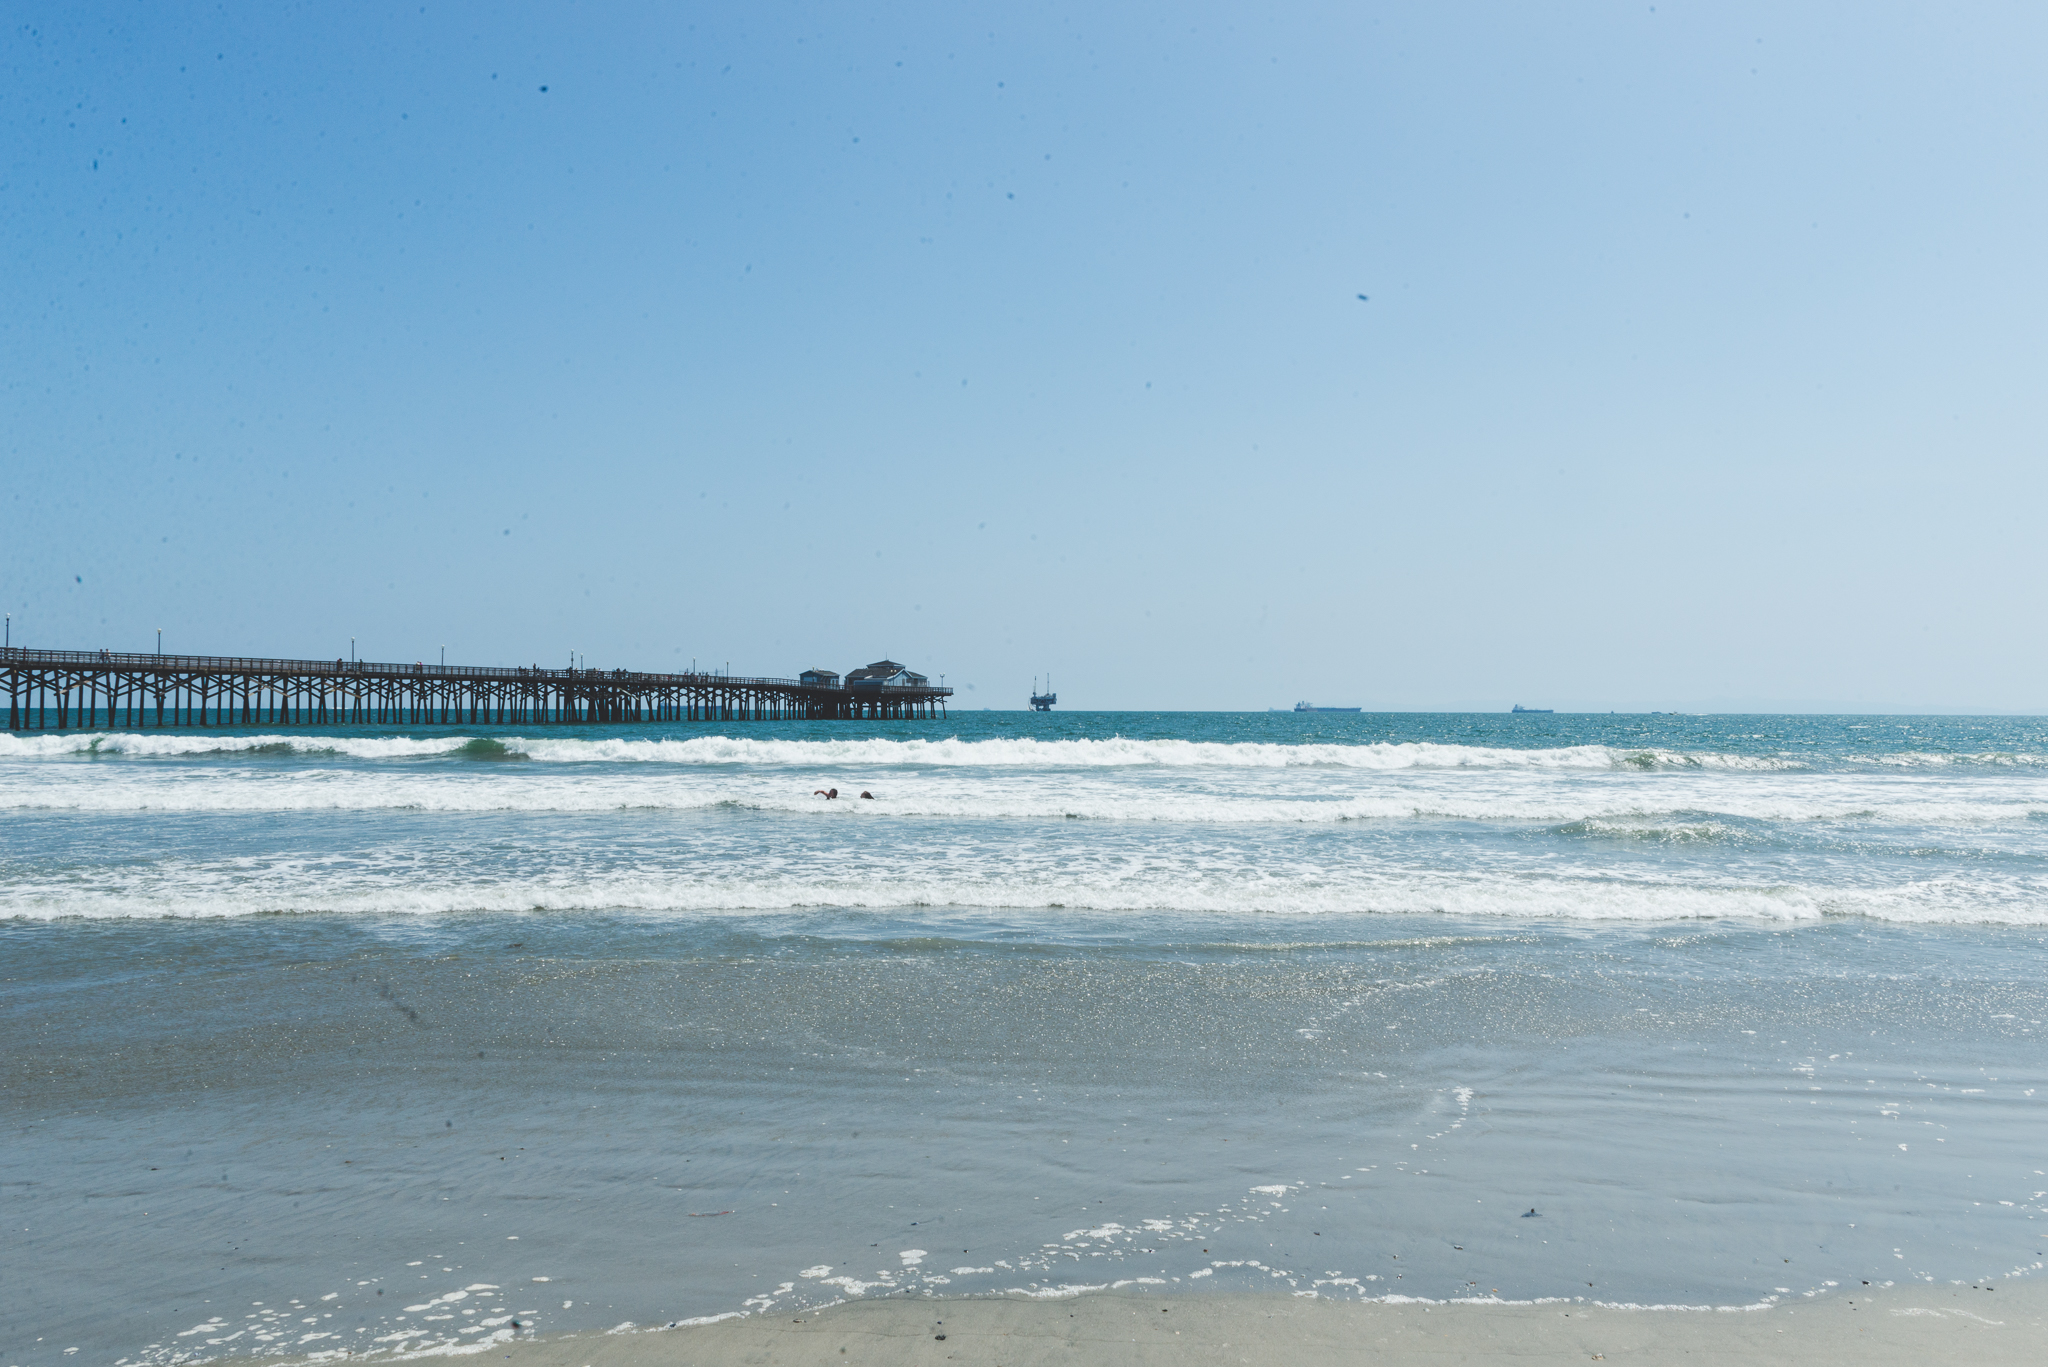 The view from Seal Beach! / 5/14/16 / Seal Beach, CA